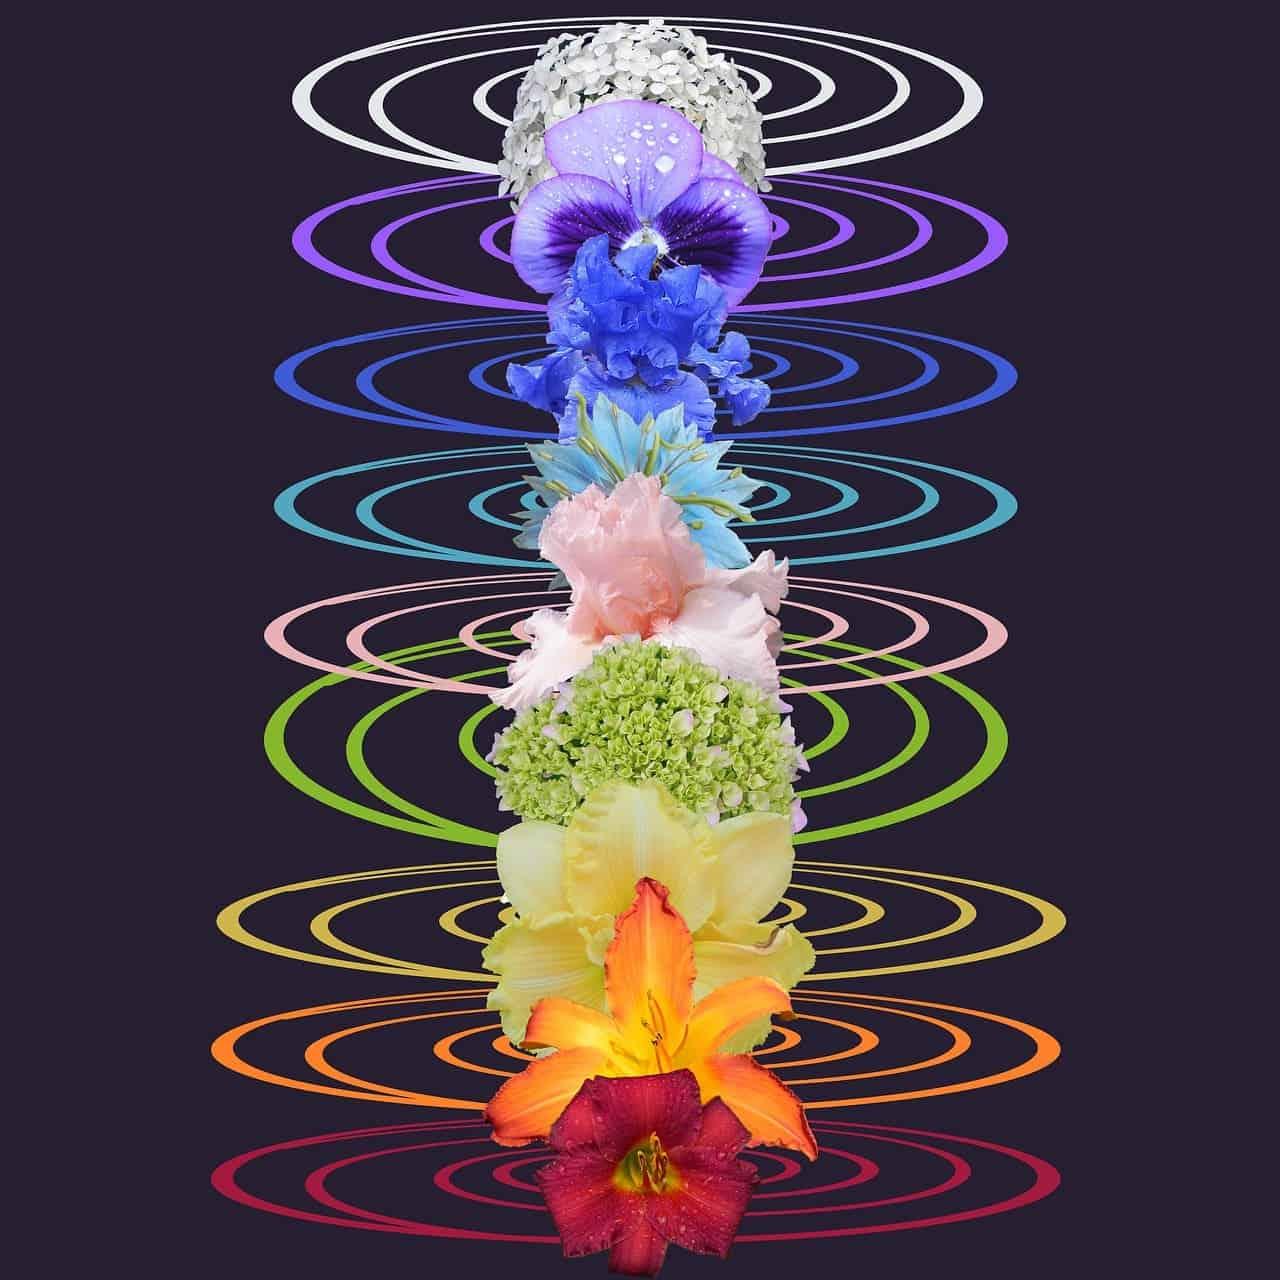 7 chakra flowers reikishamanichealing